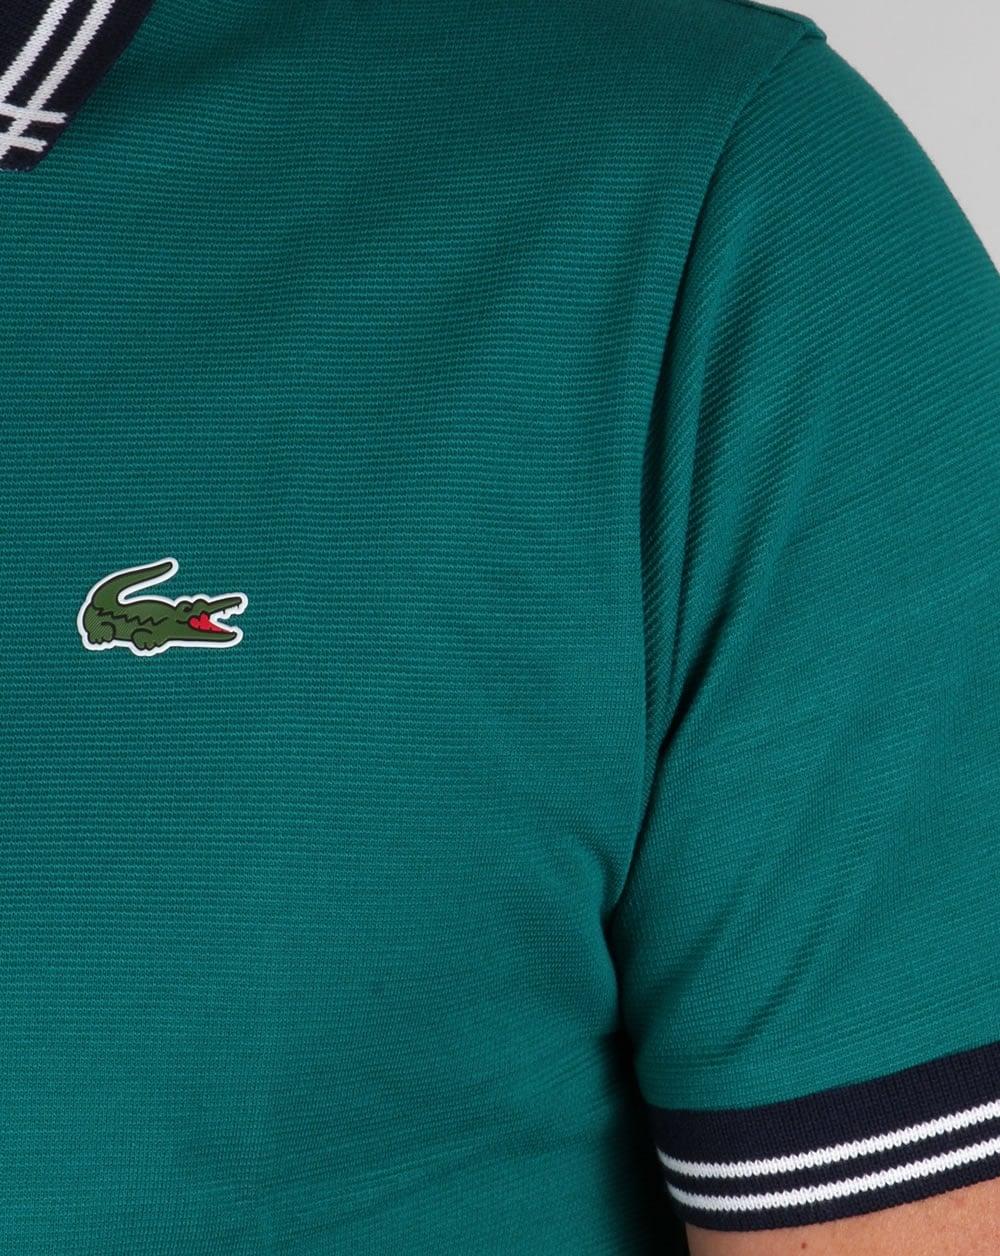 Lacoste Piping Collar Golf Polo Shirt Duck Greennavy